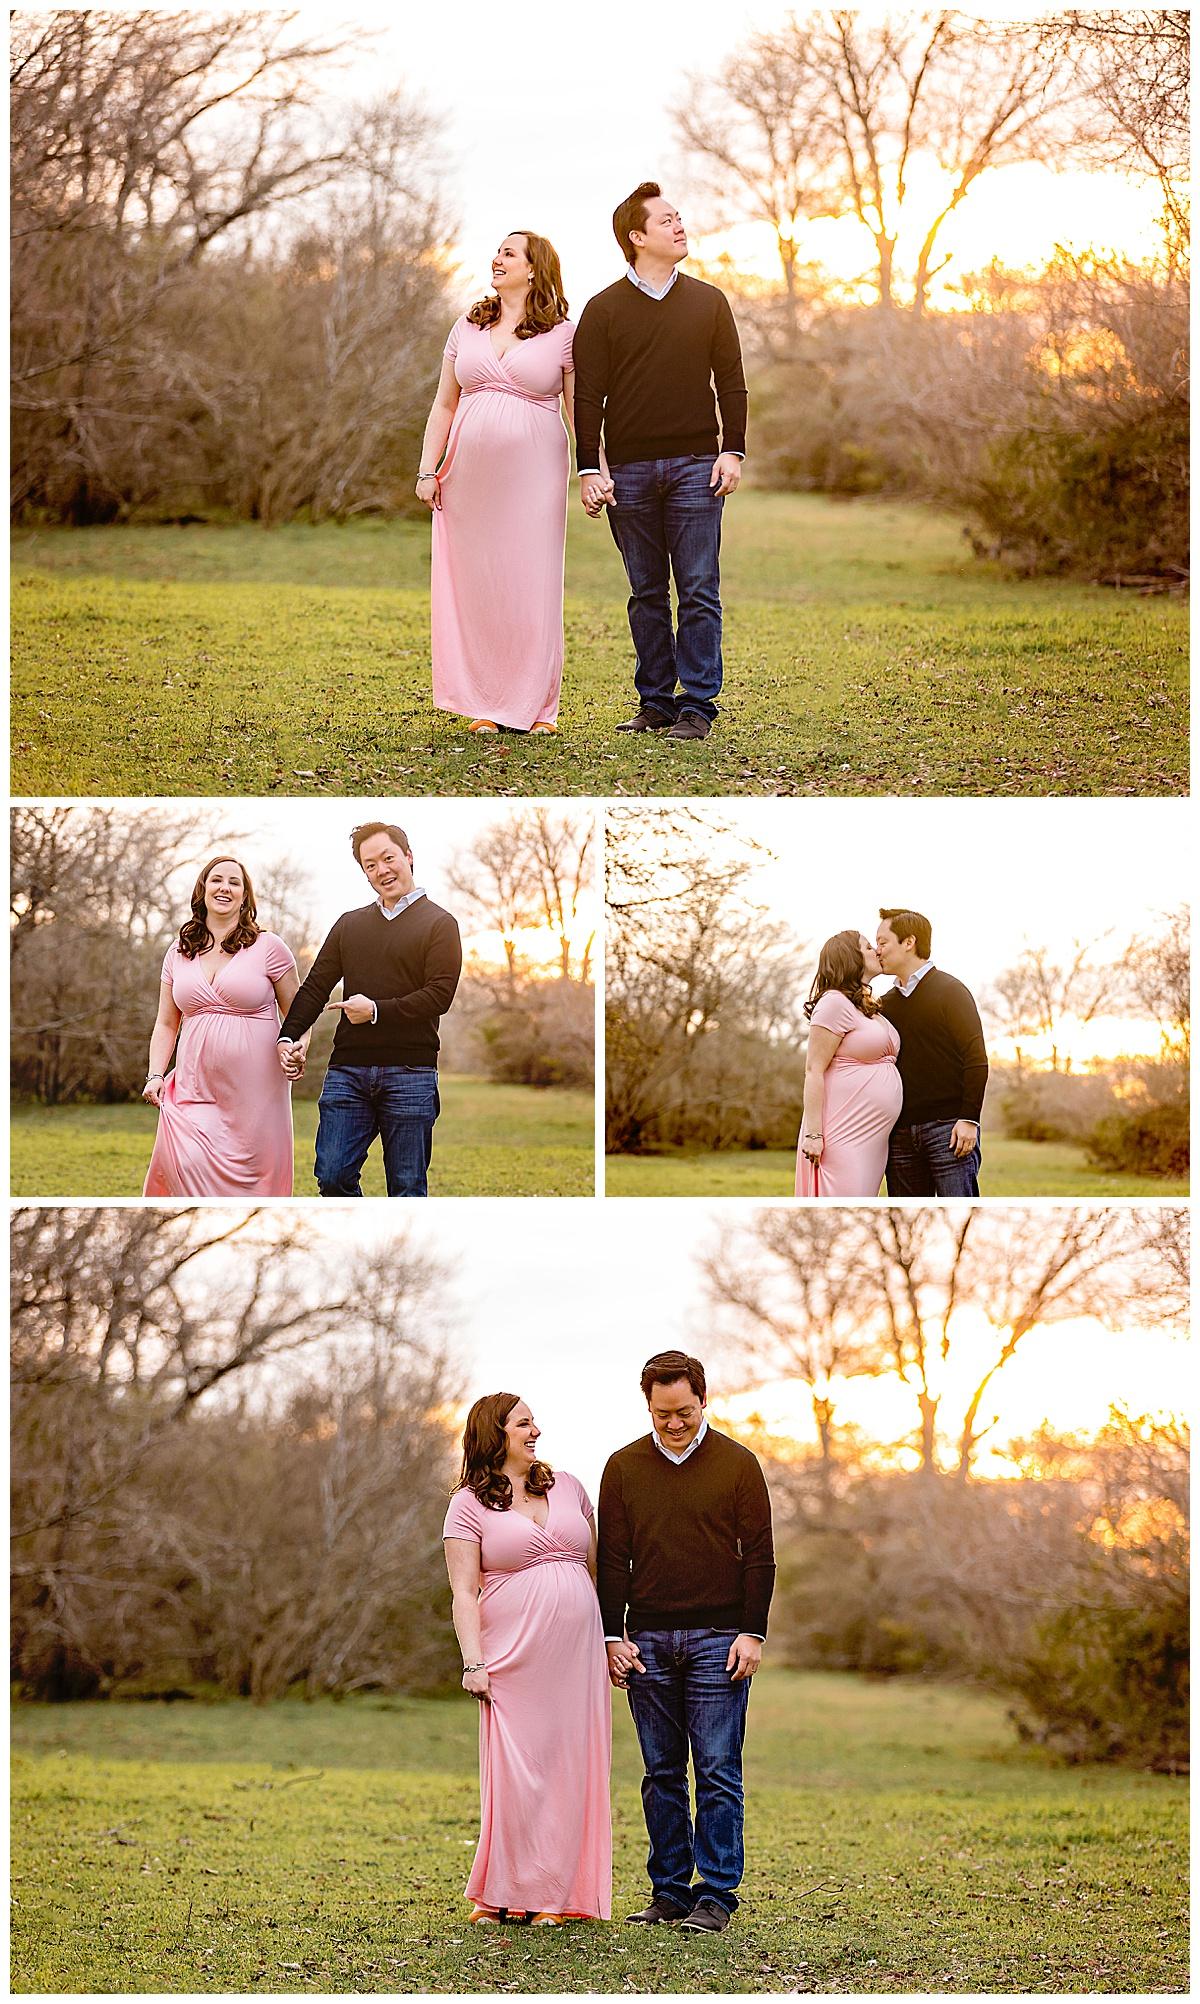 Maternity-Photographer-Texas-Carly-Barton-Photography-LaVernia-Photos_0003.jpg